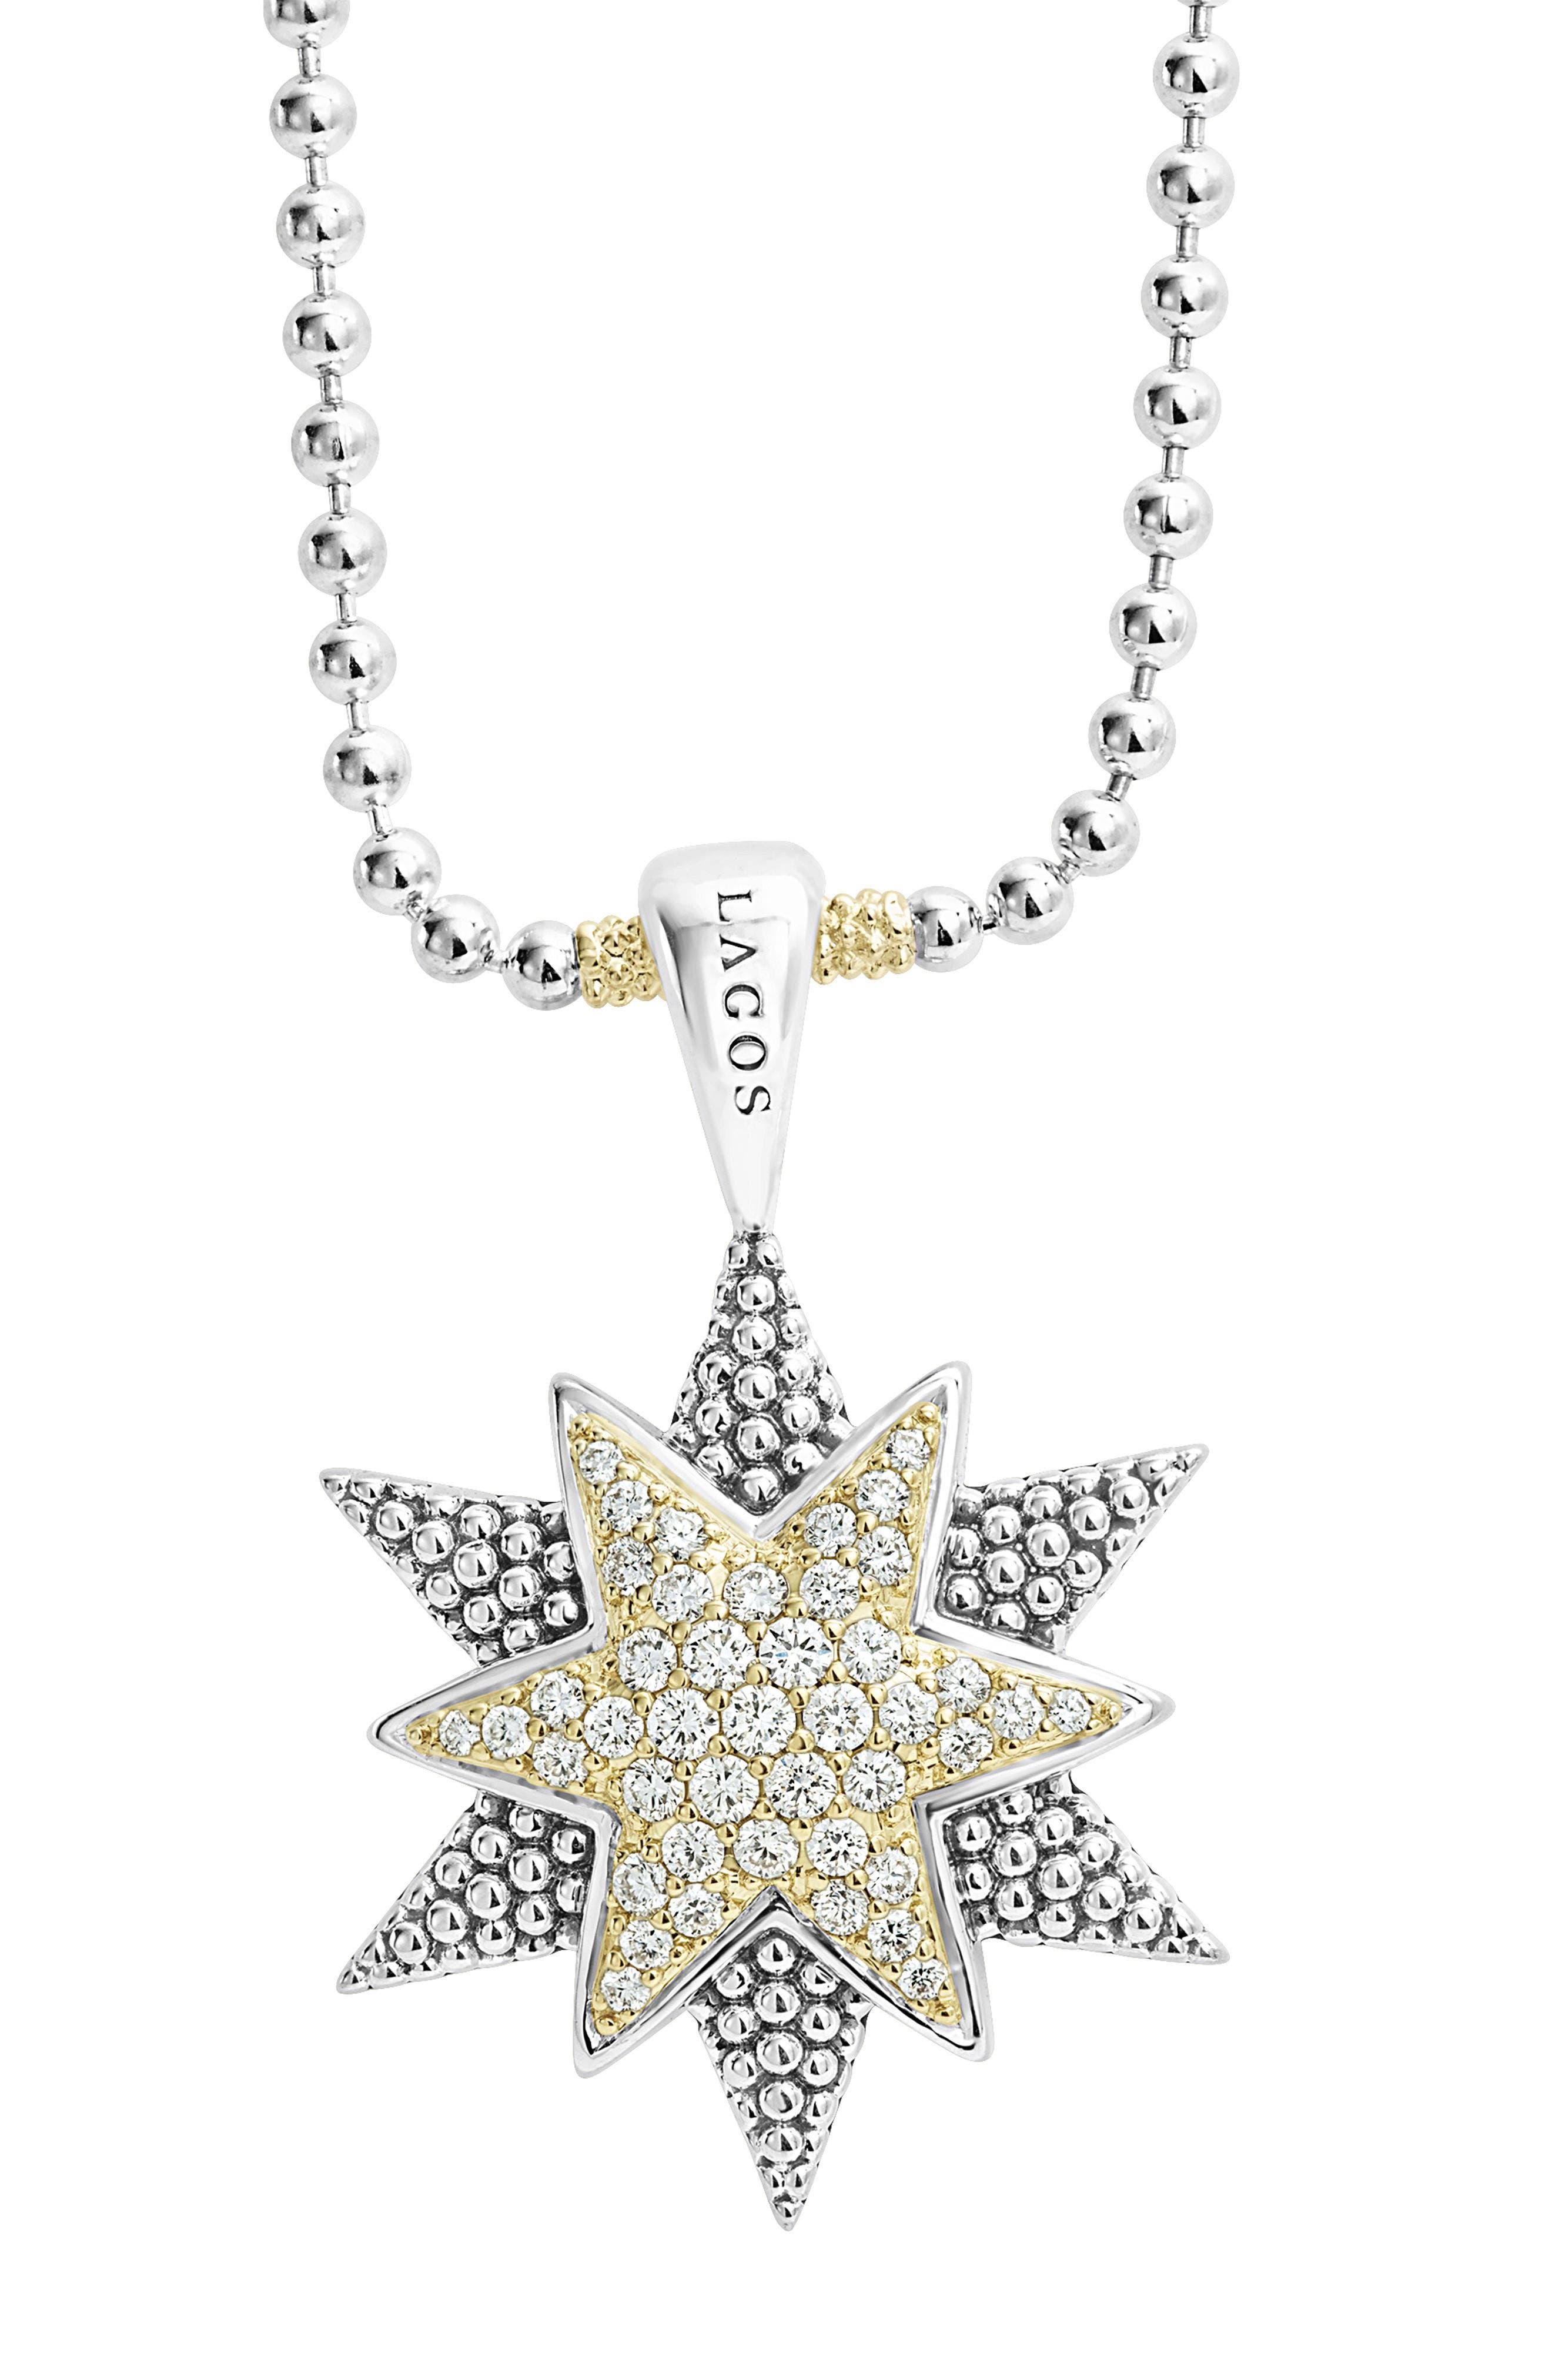 North Star Large Diamond Pendant Necklace,                             Alternate thumbnail 5, color,                             Diamond